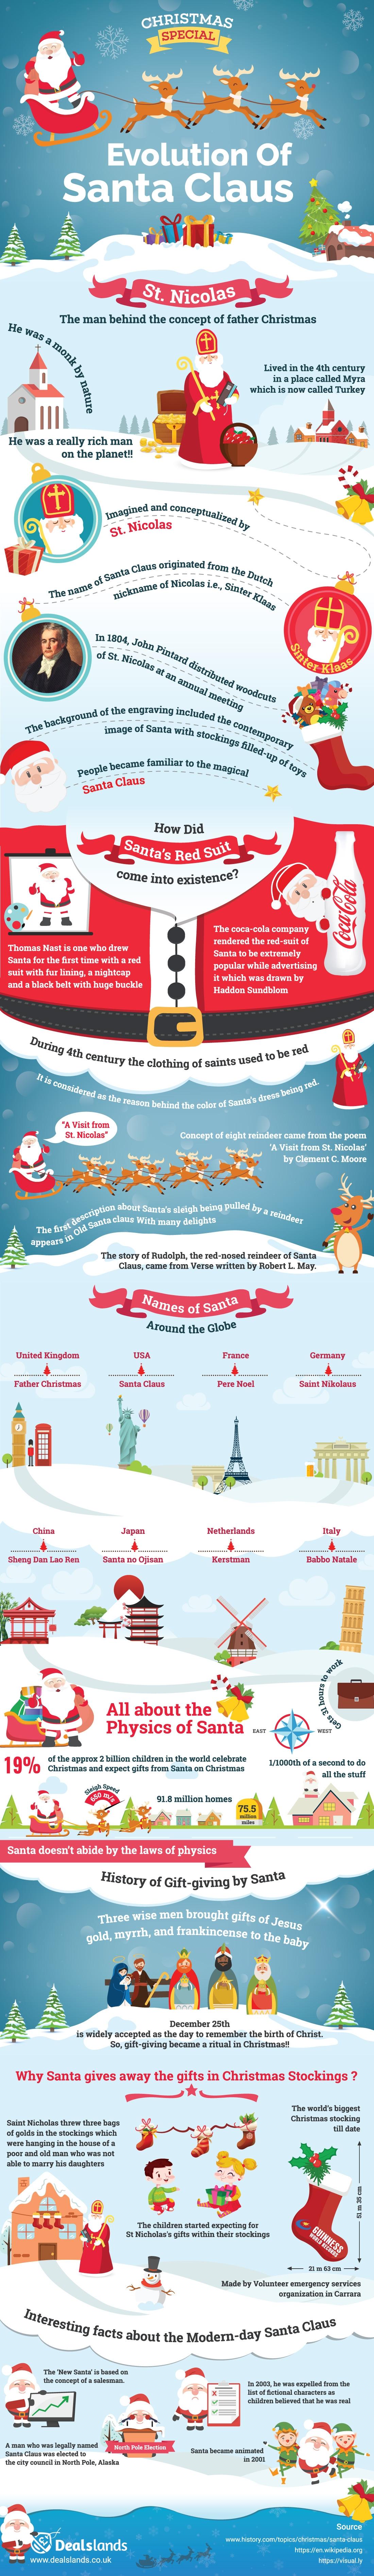 Evolution Of Santa Claus